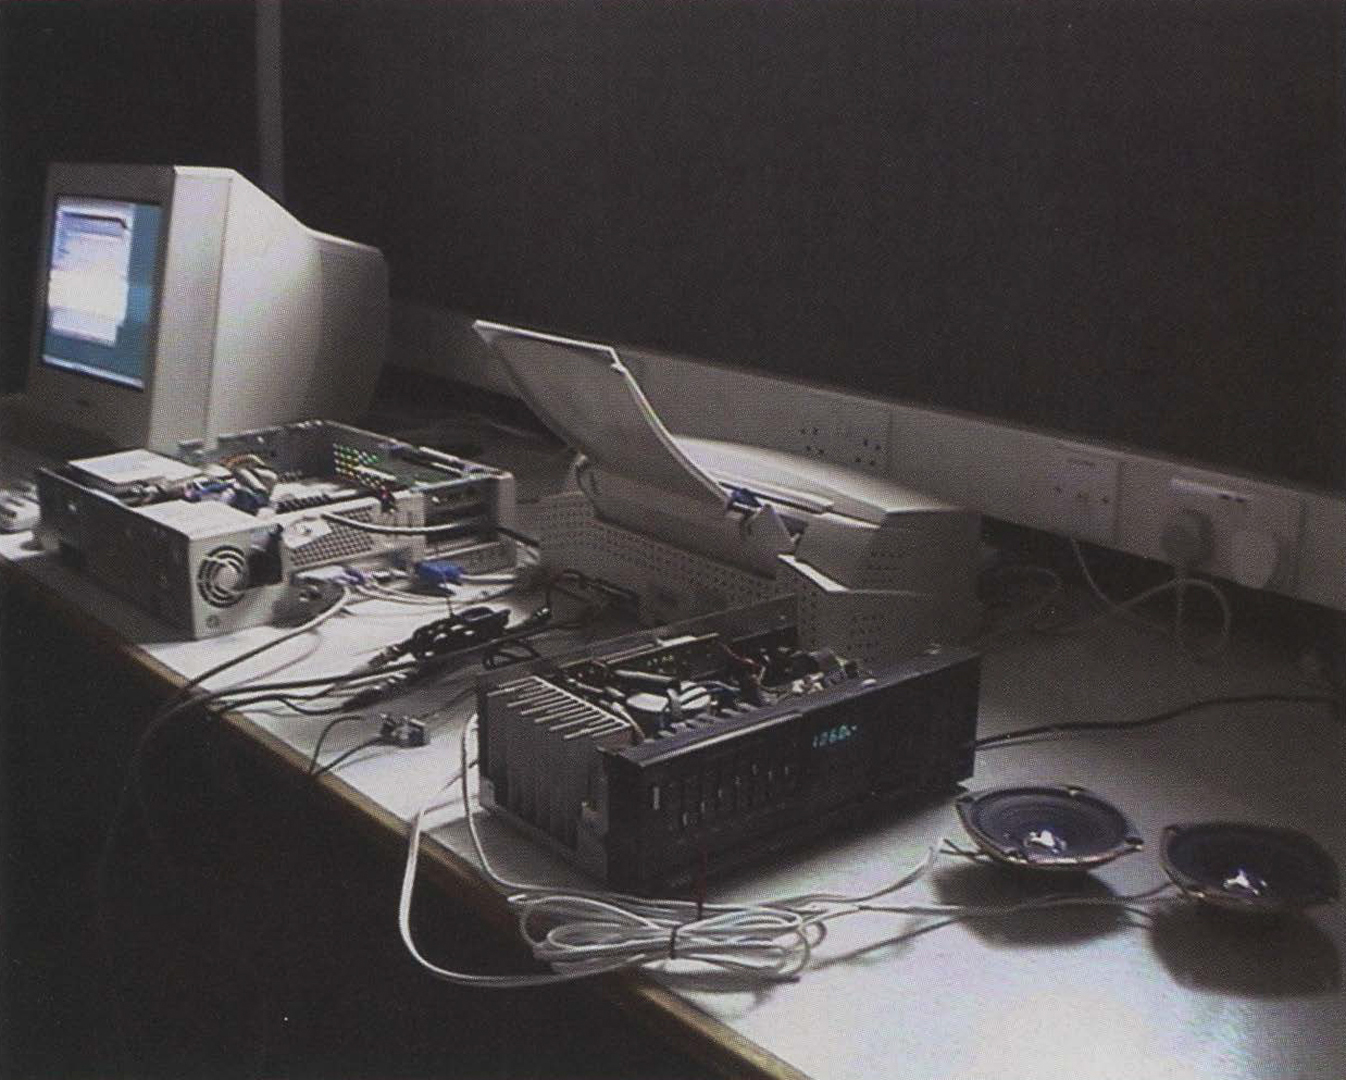 ©2004, Eva Verhoeven, Audio Printer